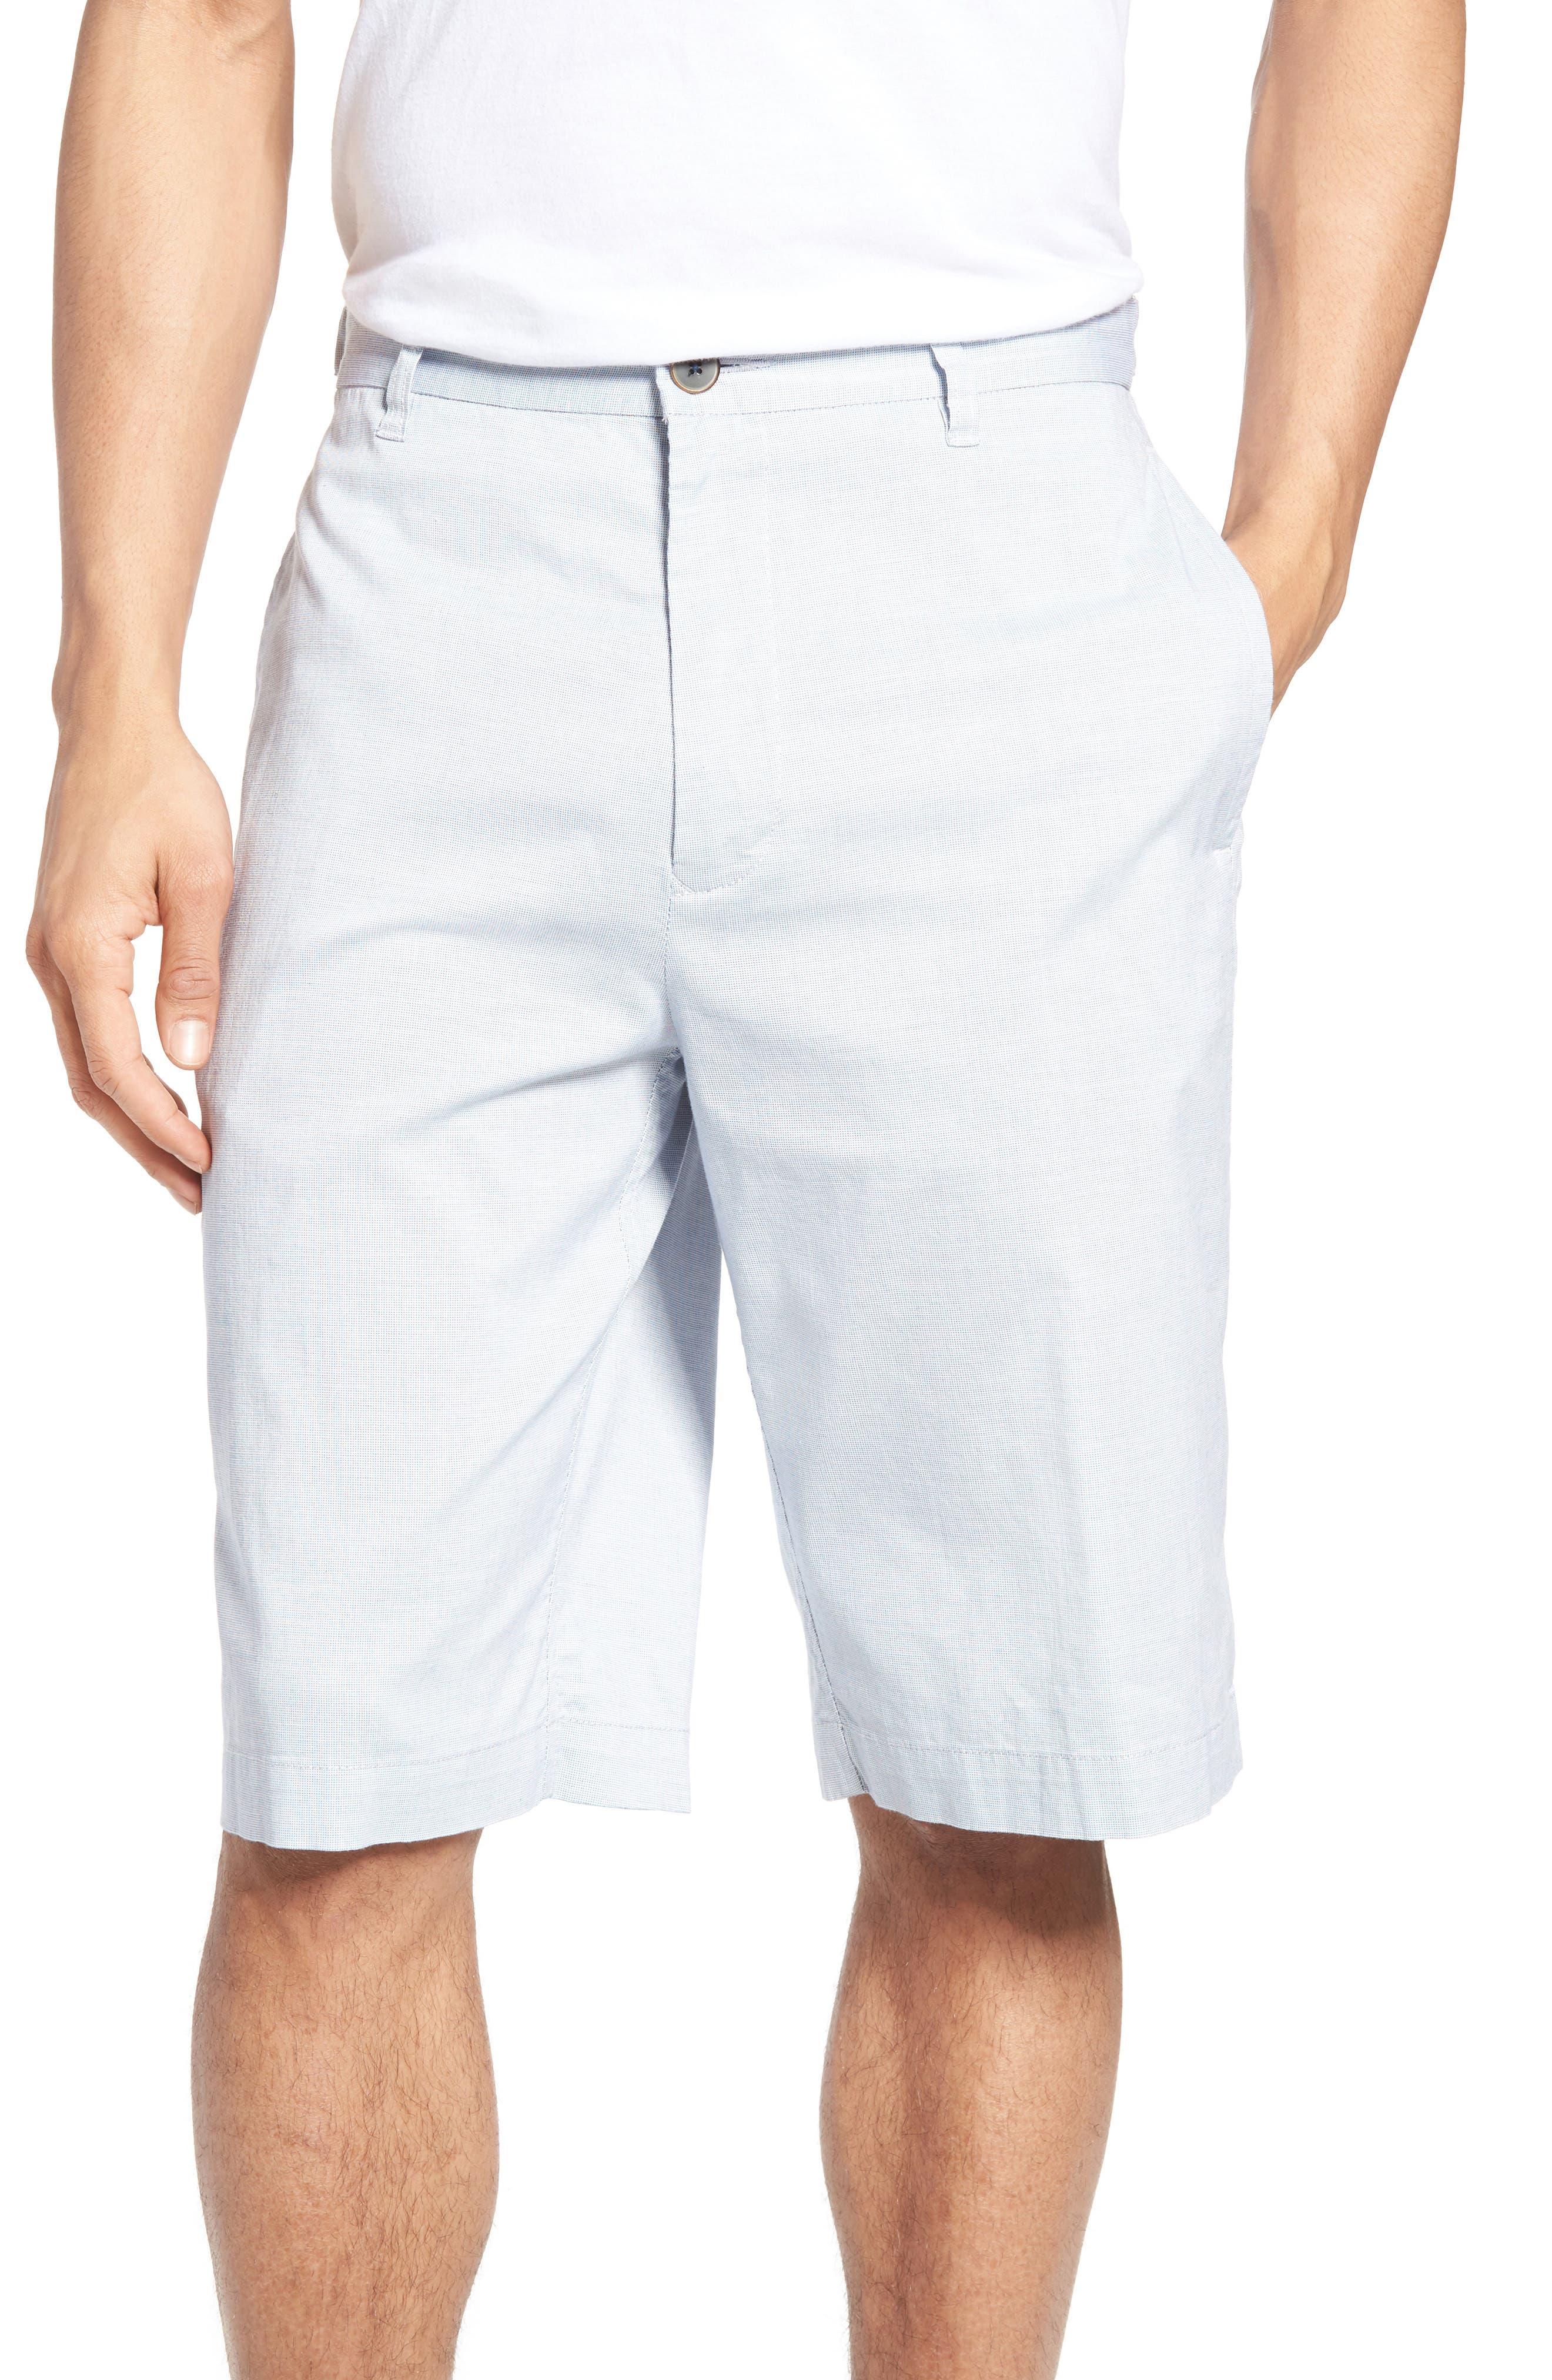 Rodd & Gunn Fairview Shorts